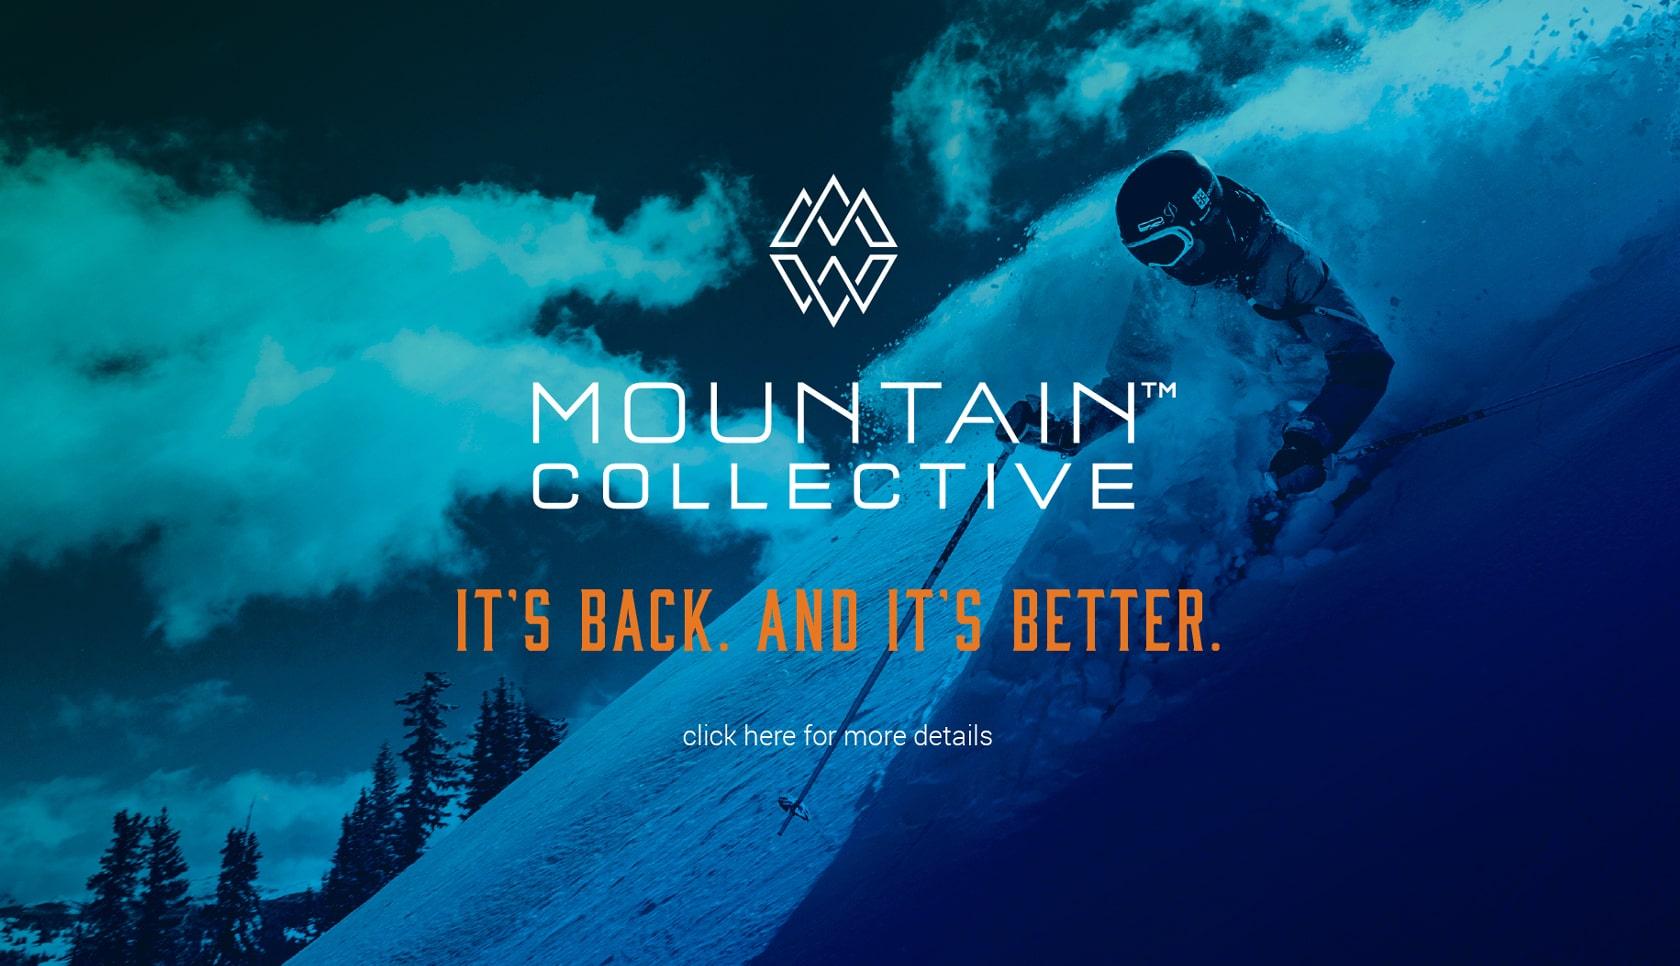 Mountain Collective|ニセコユナイテッドとニセコビレッジが、Mountain Collectiveのフルメンバーリゾートに昇格しました!